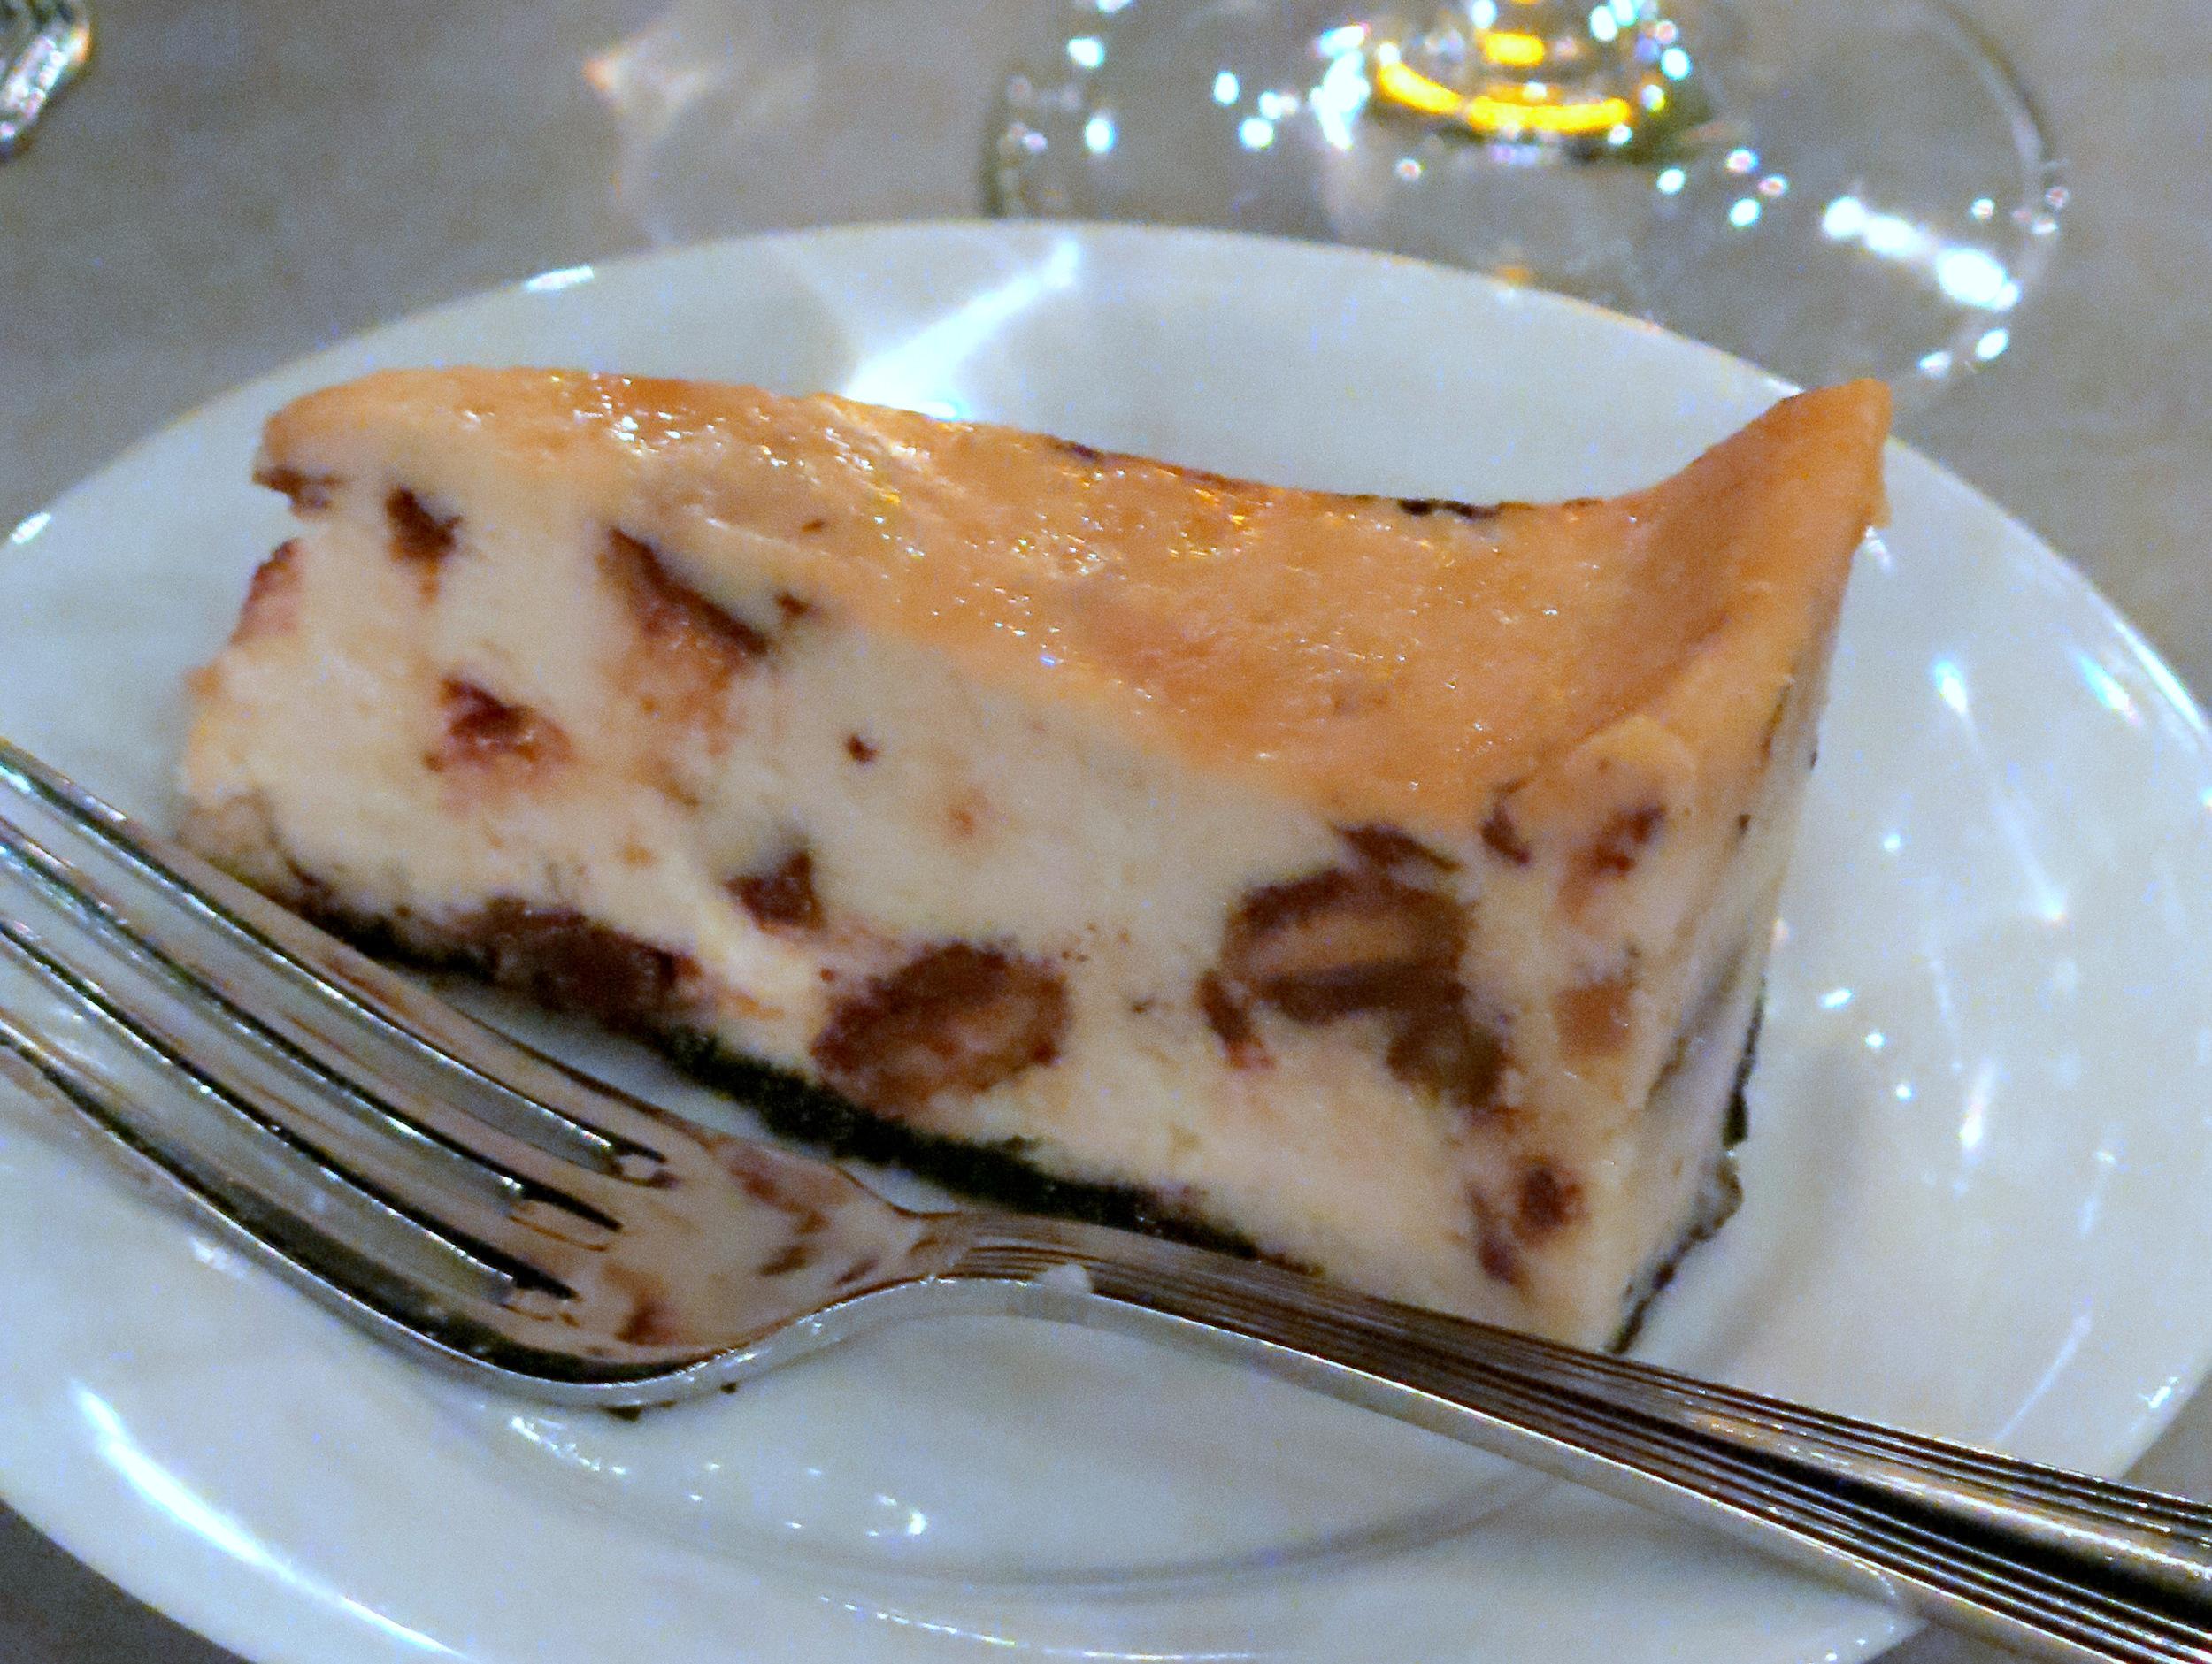 Dessert, too!! Butterfinger cheesecake (vegan, of course)